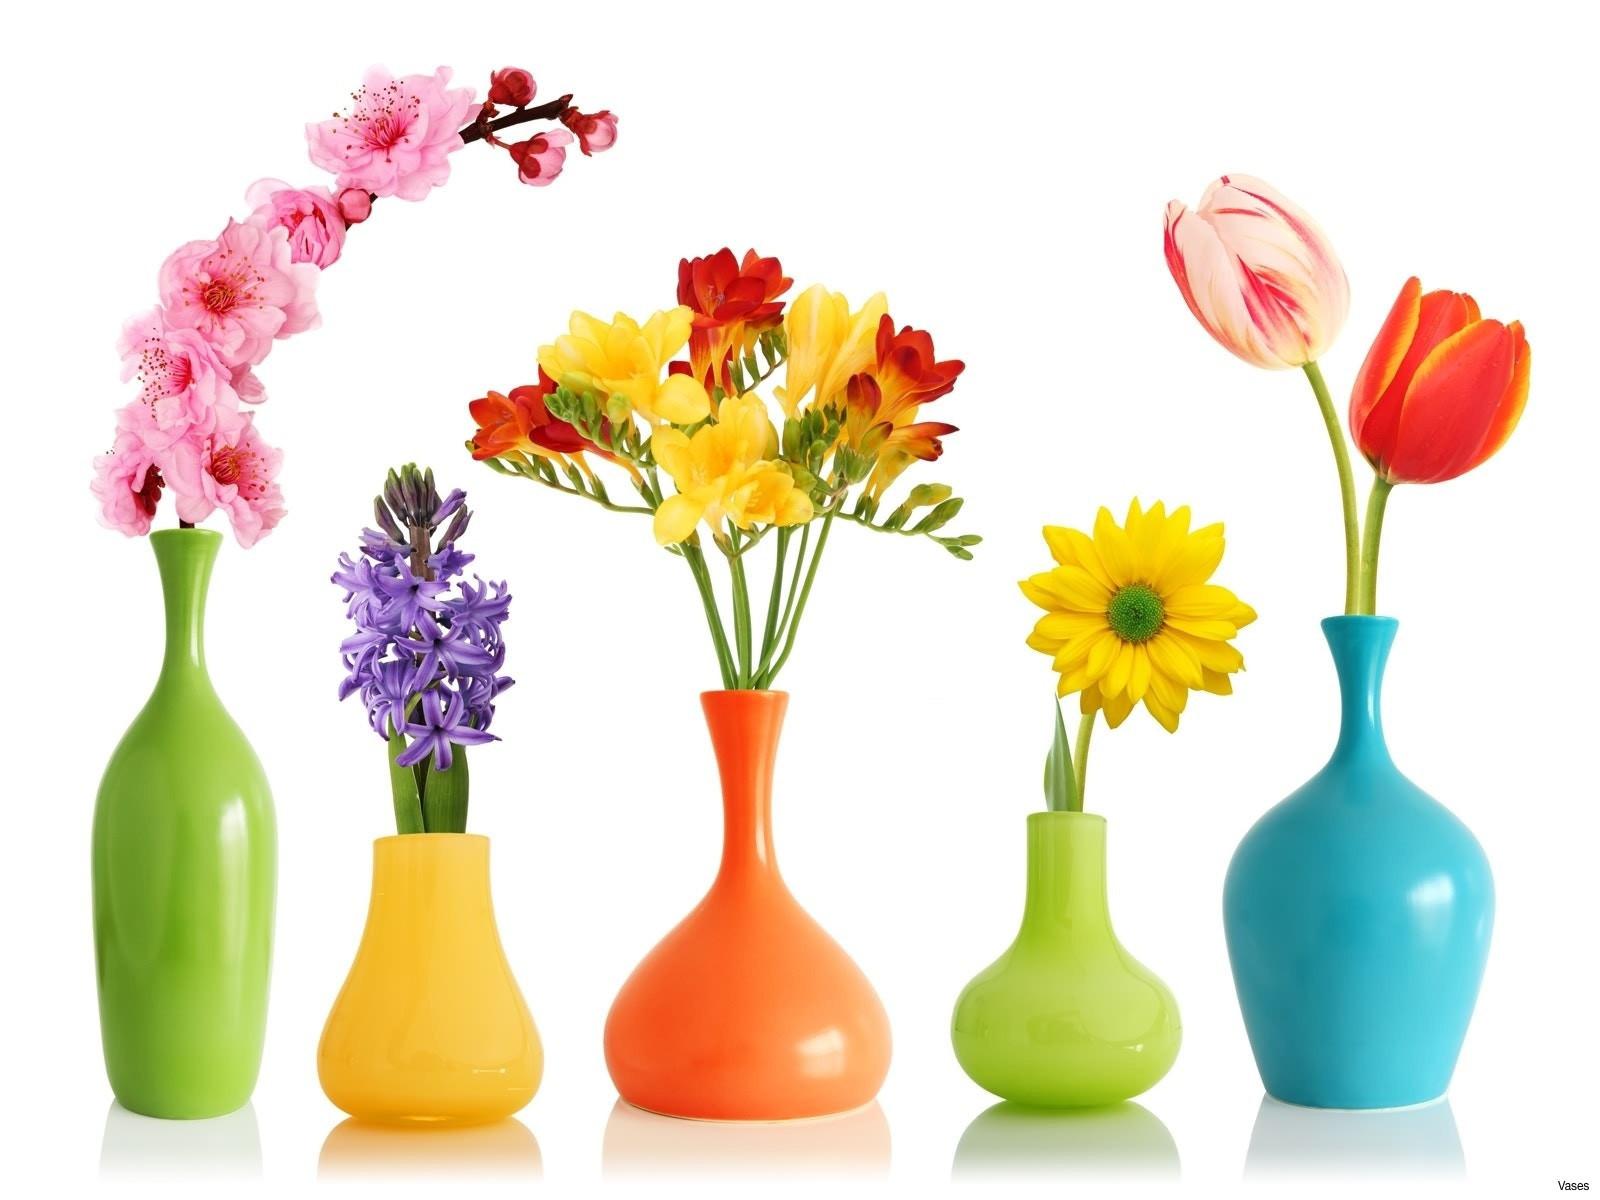 flower vase pic of 18best of colorful flowers pictures clip arts coloring pages inside colorful flowers pictures new colorful etched vasesh vases flower vase i 0d design ideas flower